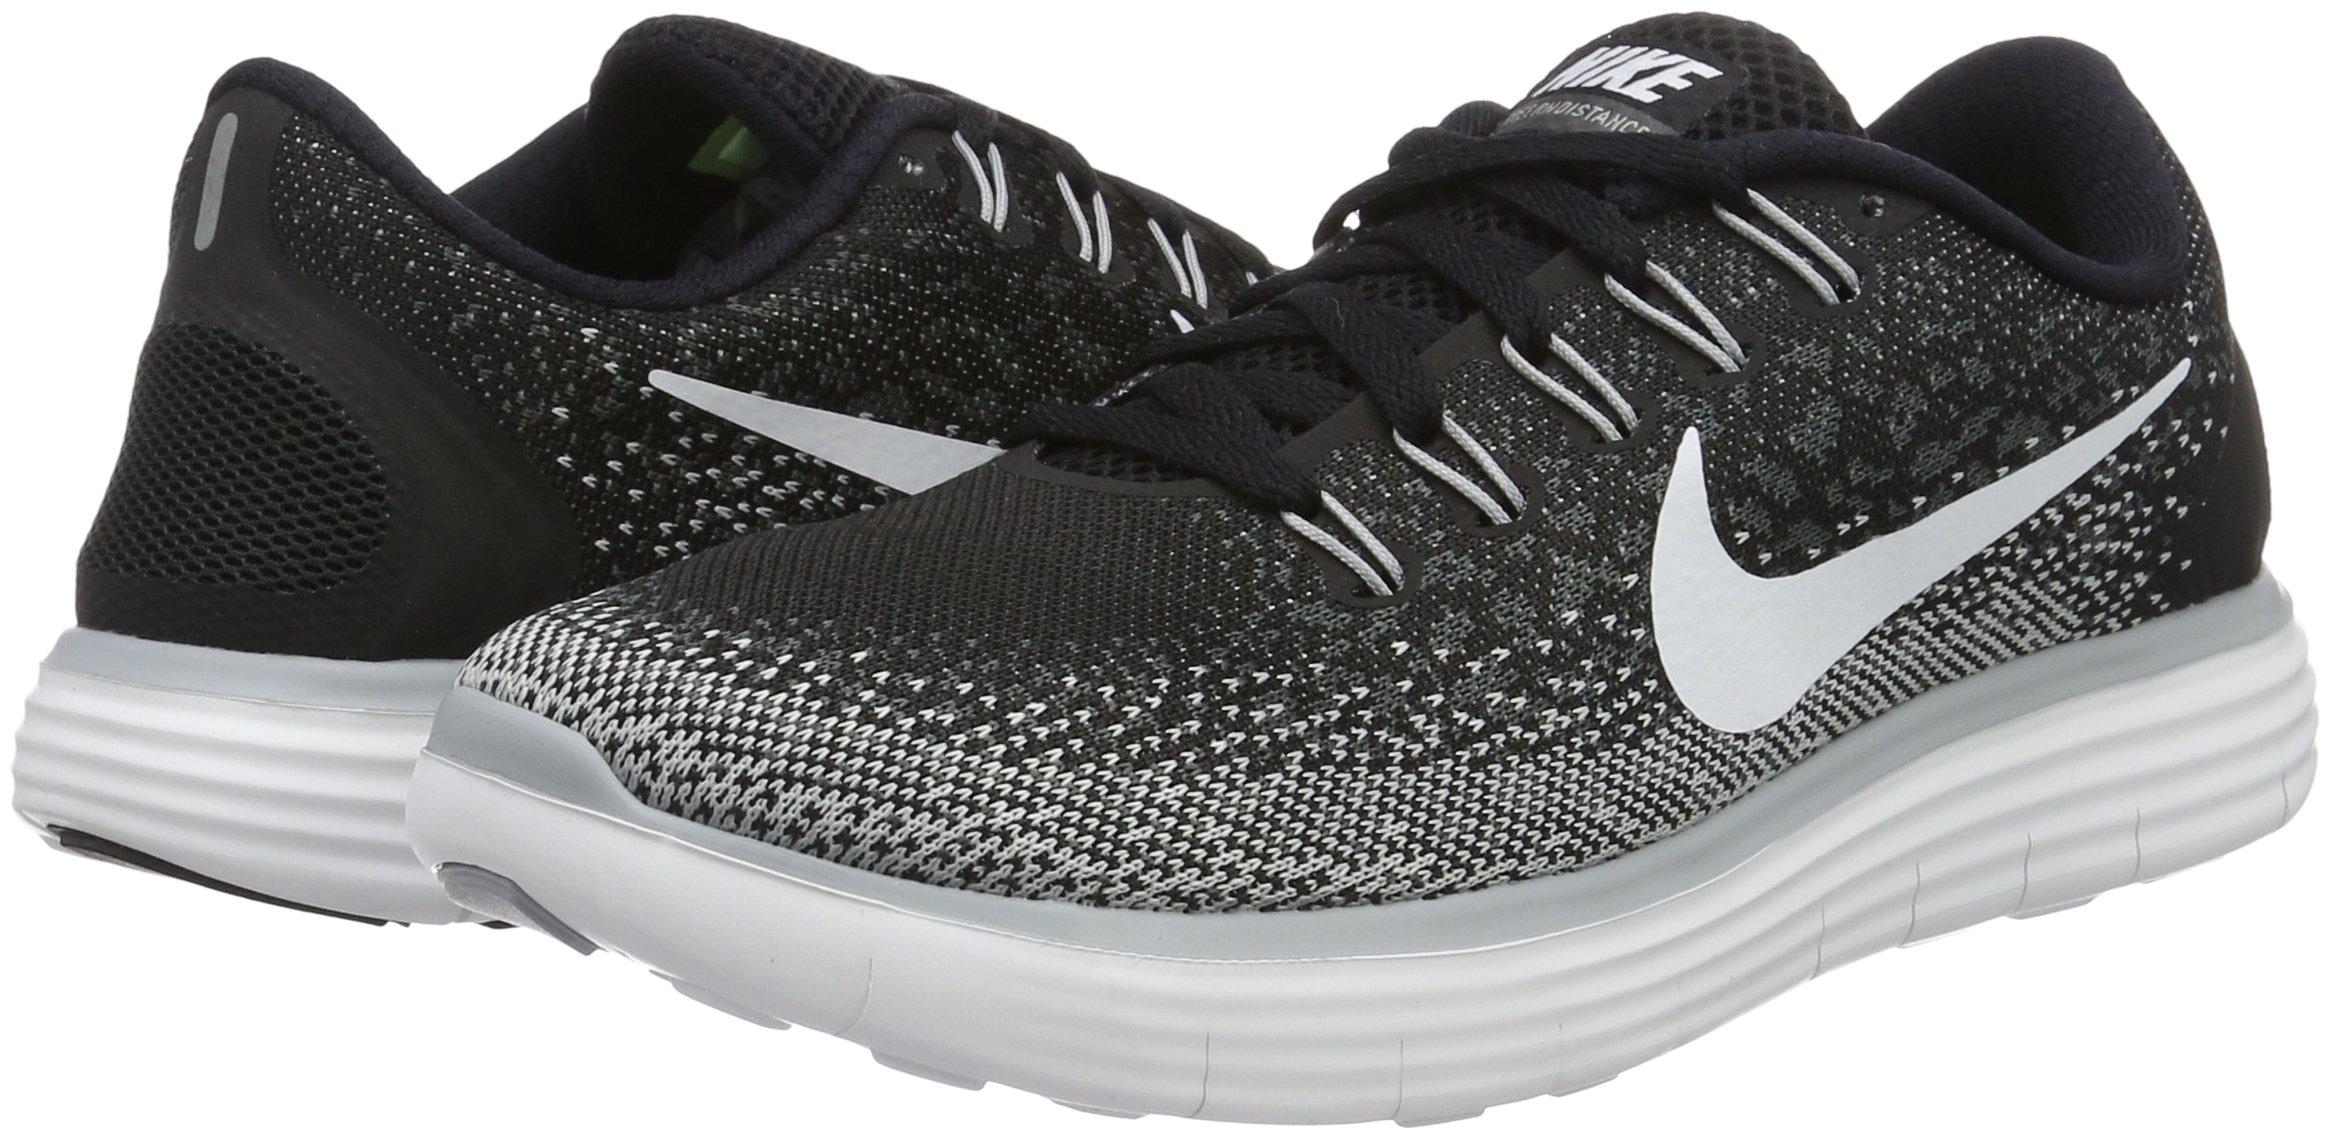 timeless design 99f46 b341e Nike Womens Free Rn Distance Running Shoe (8.5 B(M) US, Black White Dark  Grey Wlf Grey) - 827116-010 Black Dark Grey Wolf Grey White   Road Running  ...